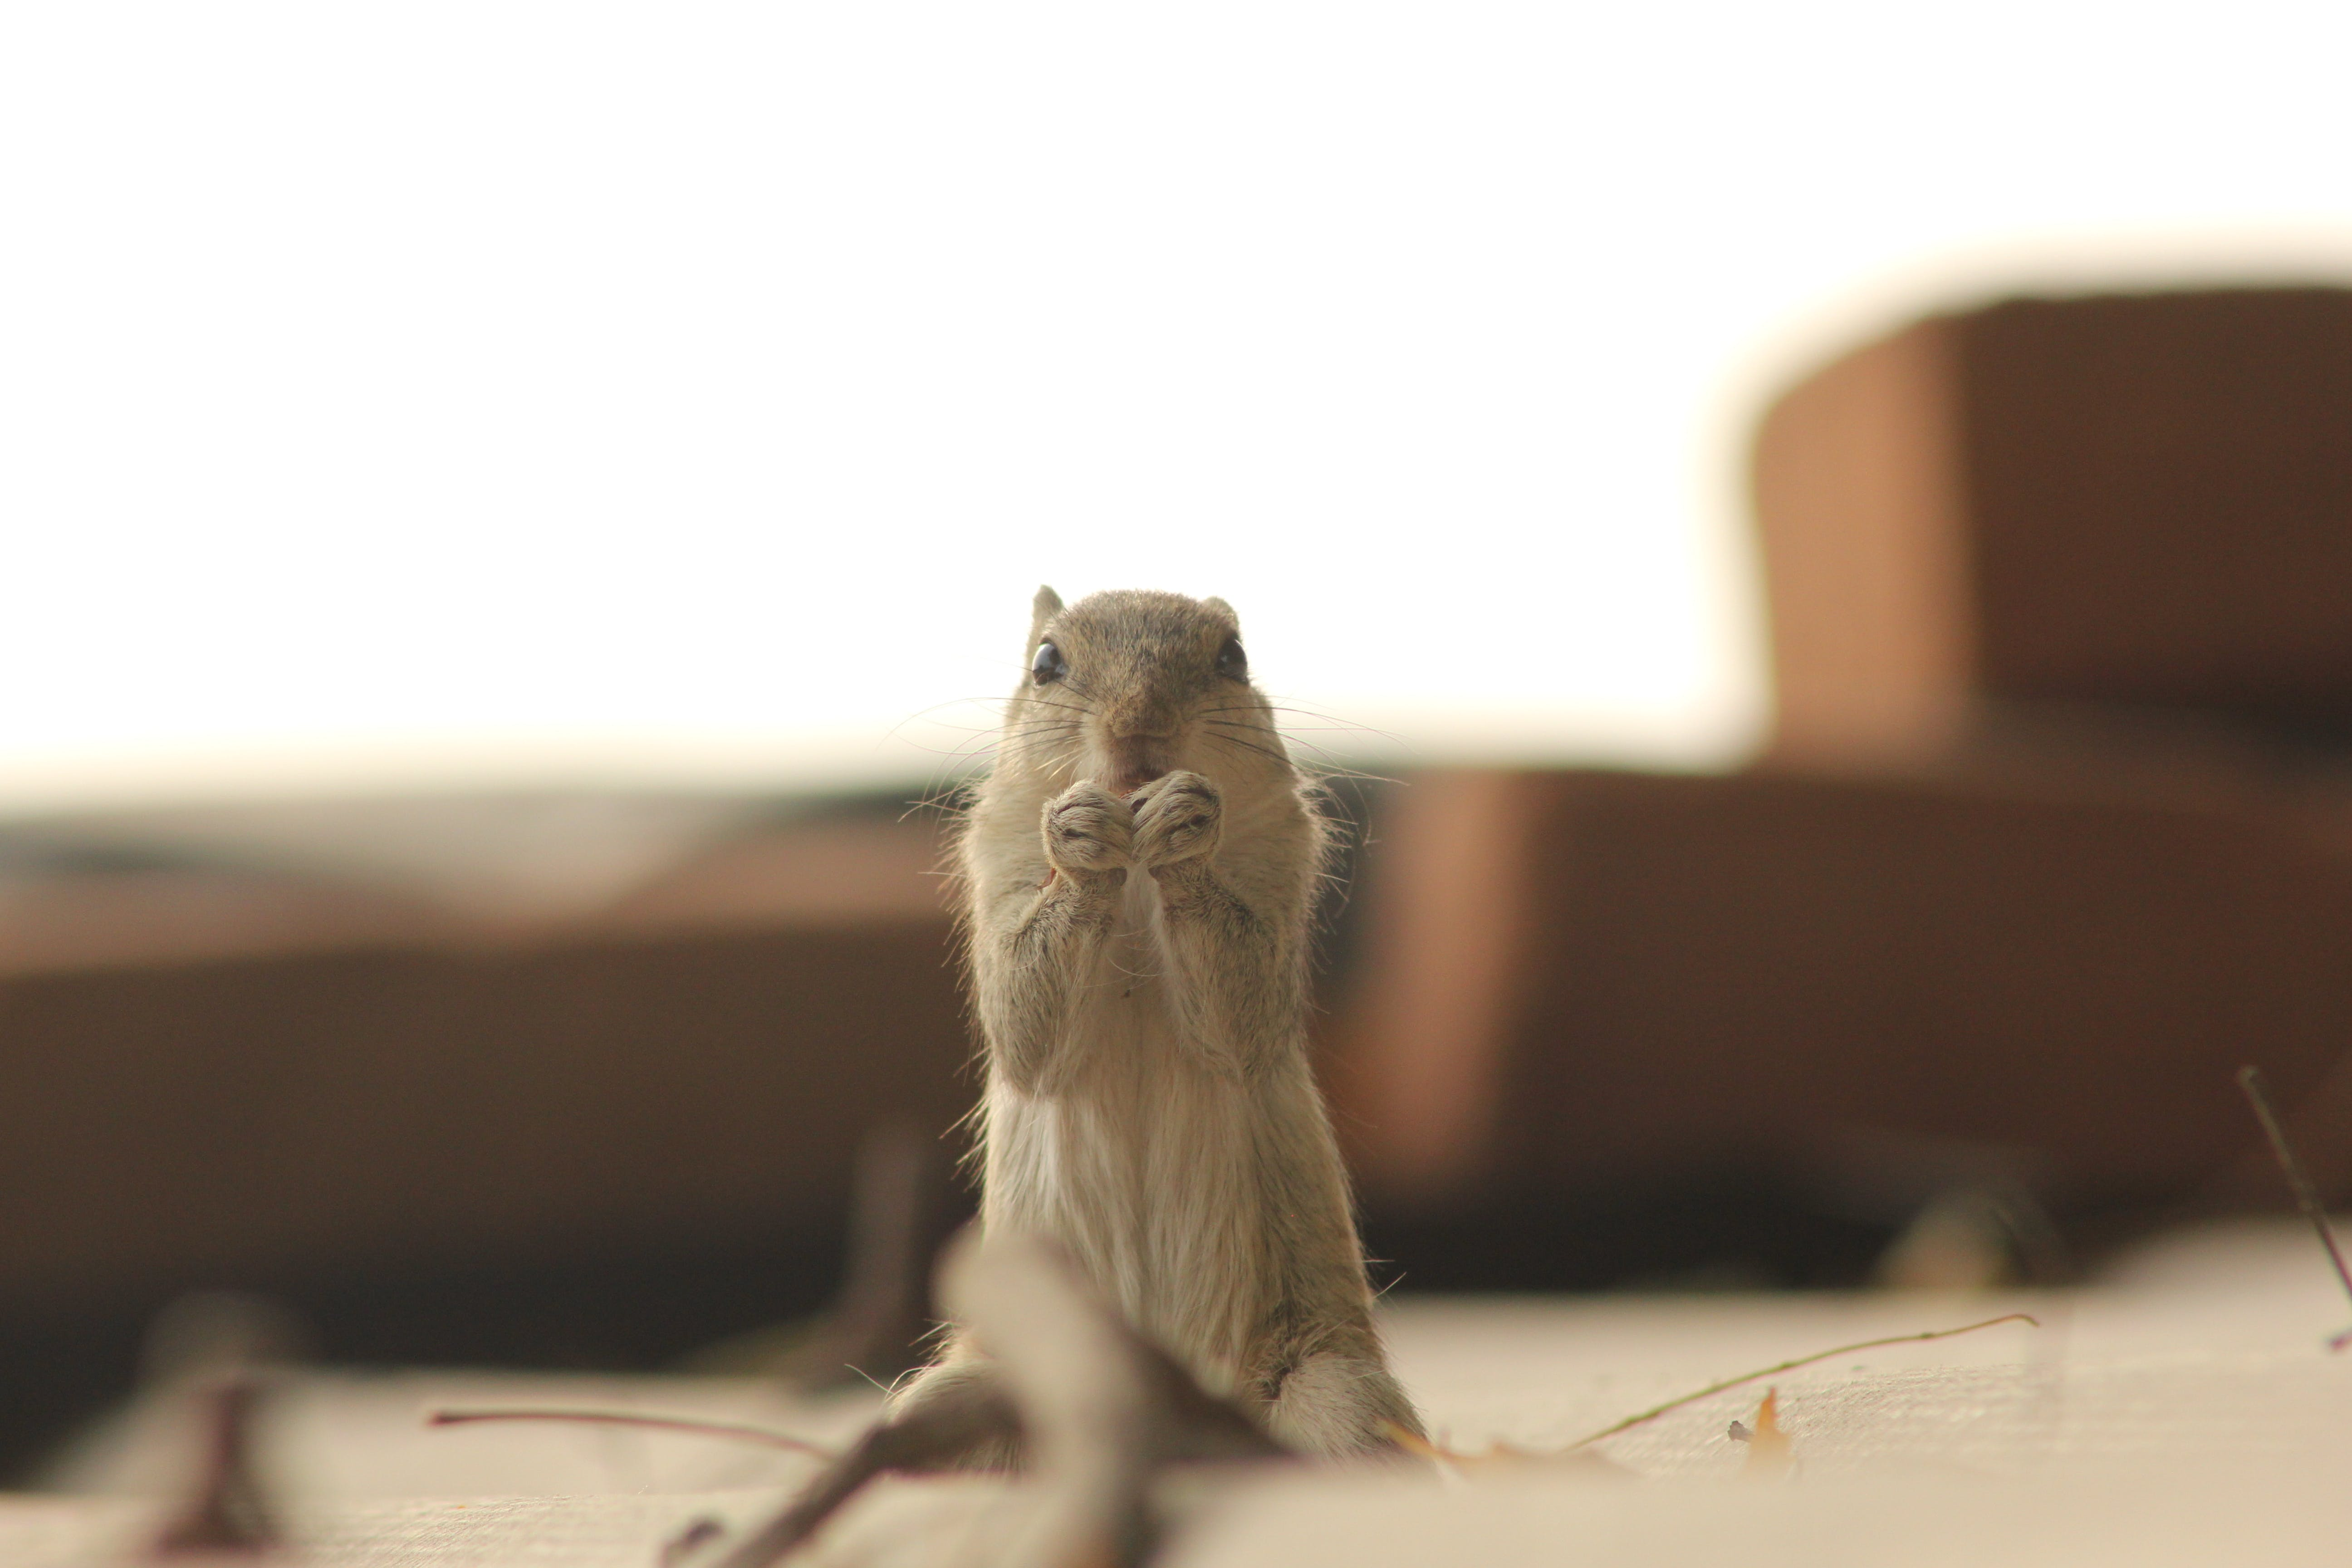 Gray Squirrel Selective Focus Photography